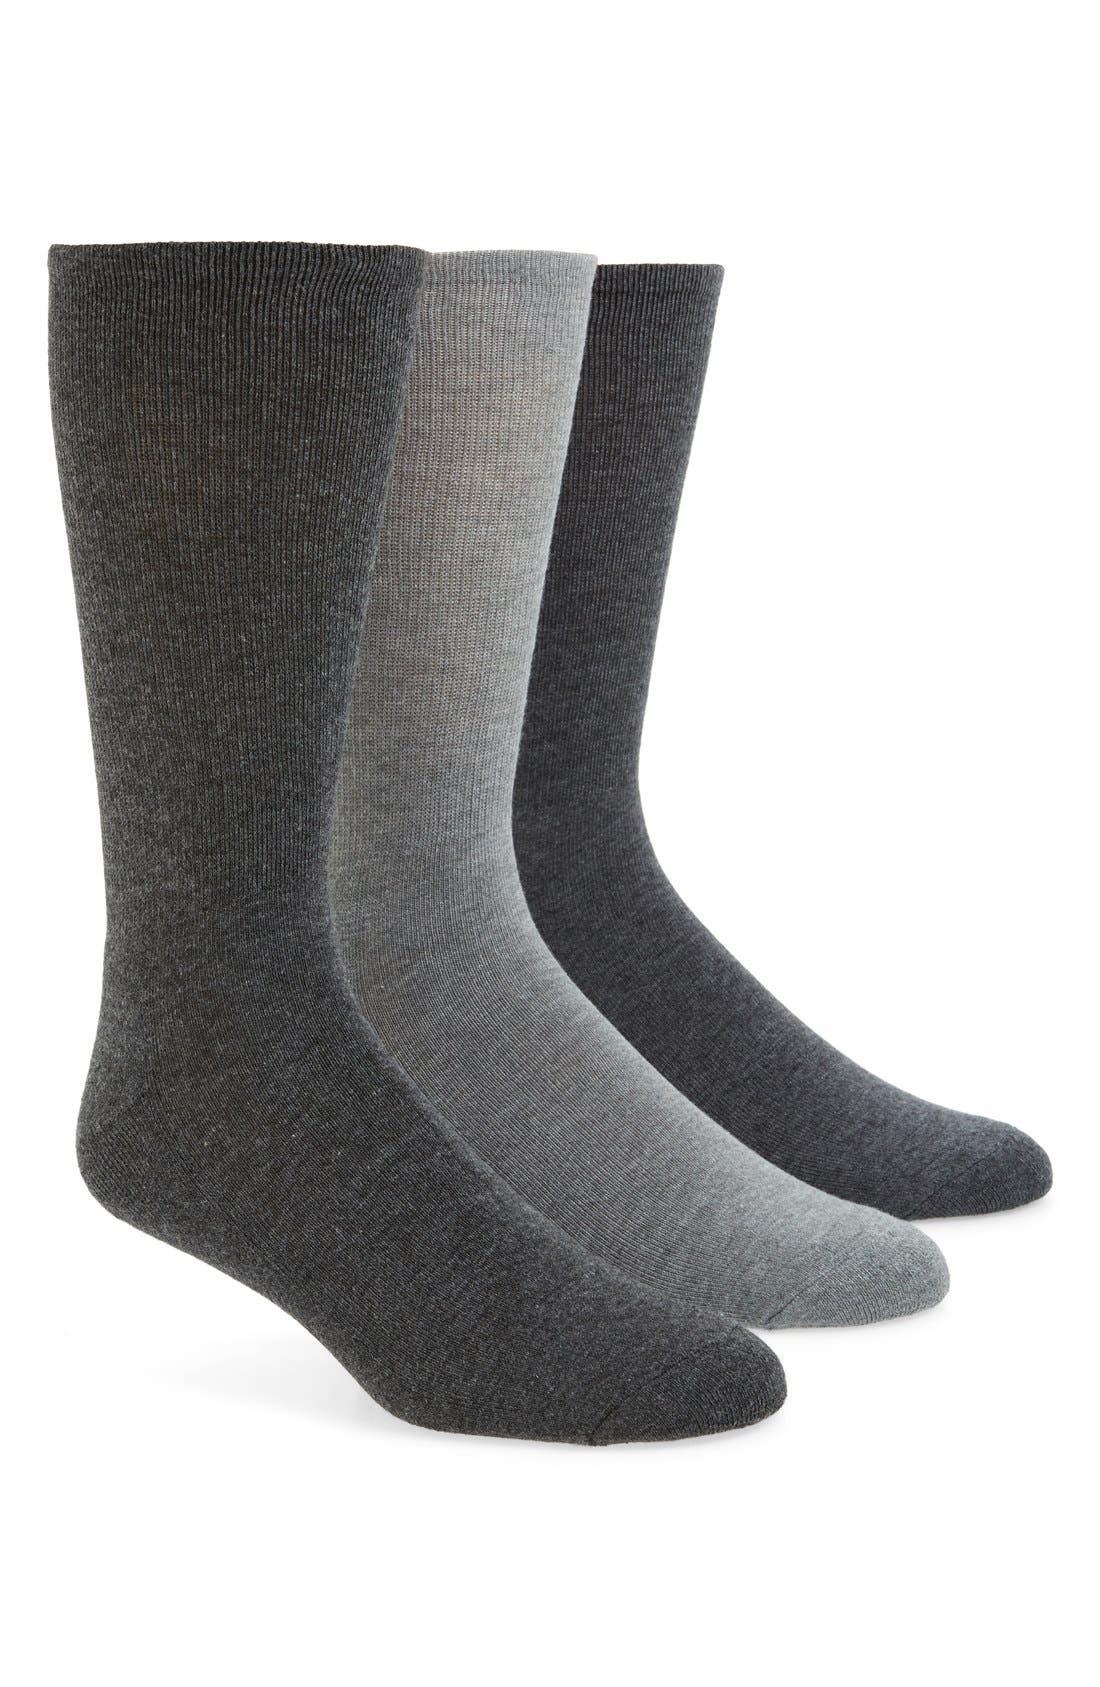 3-Pack Cotton Blend Socks,                             Main thumbnail 1, color,                             Grey